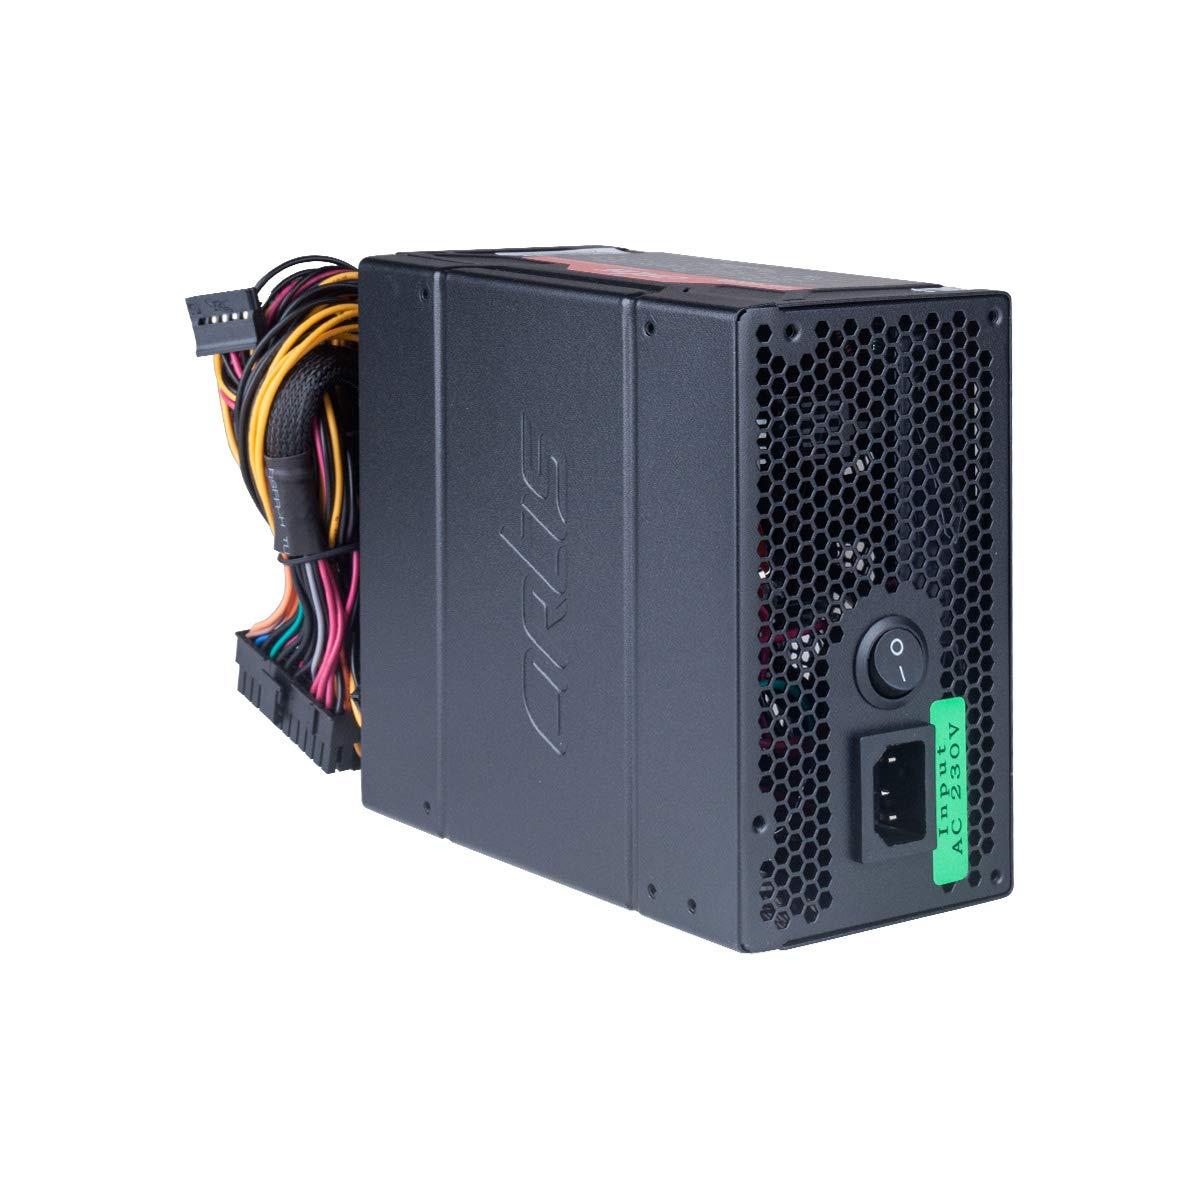 Artis AR-VIP 600W-New 600 Watt Super Silent Power Supply Unit (Black)